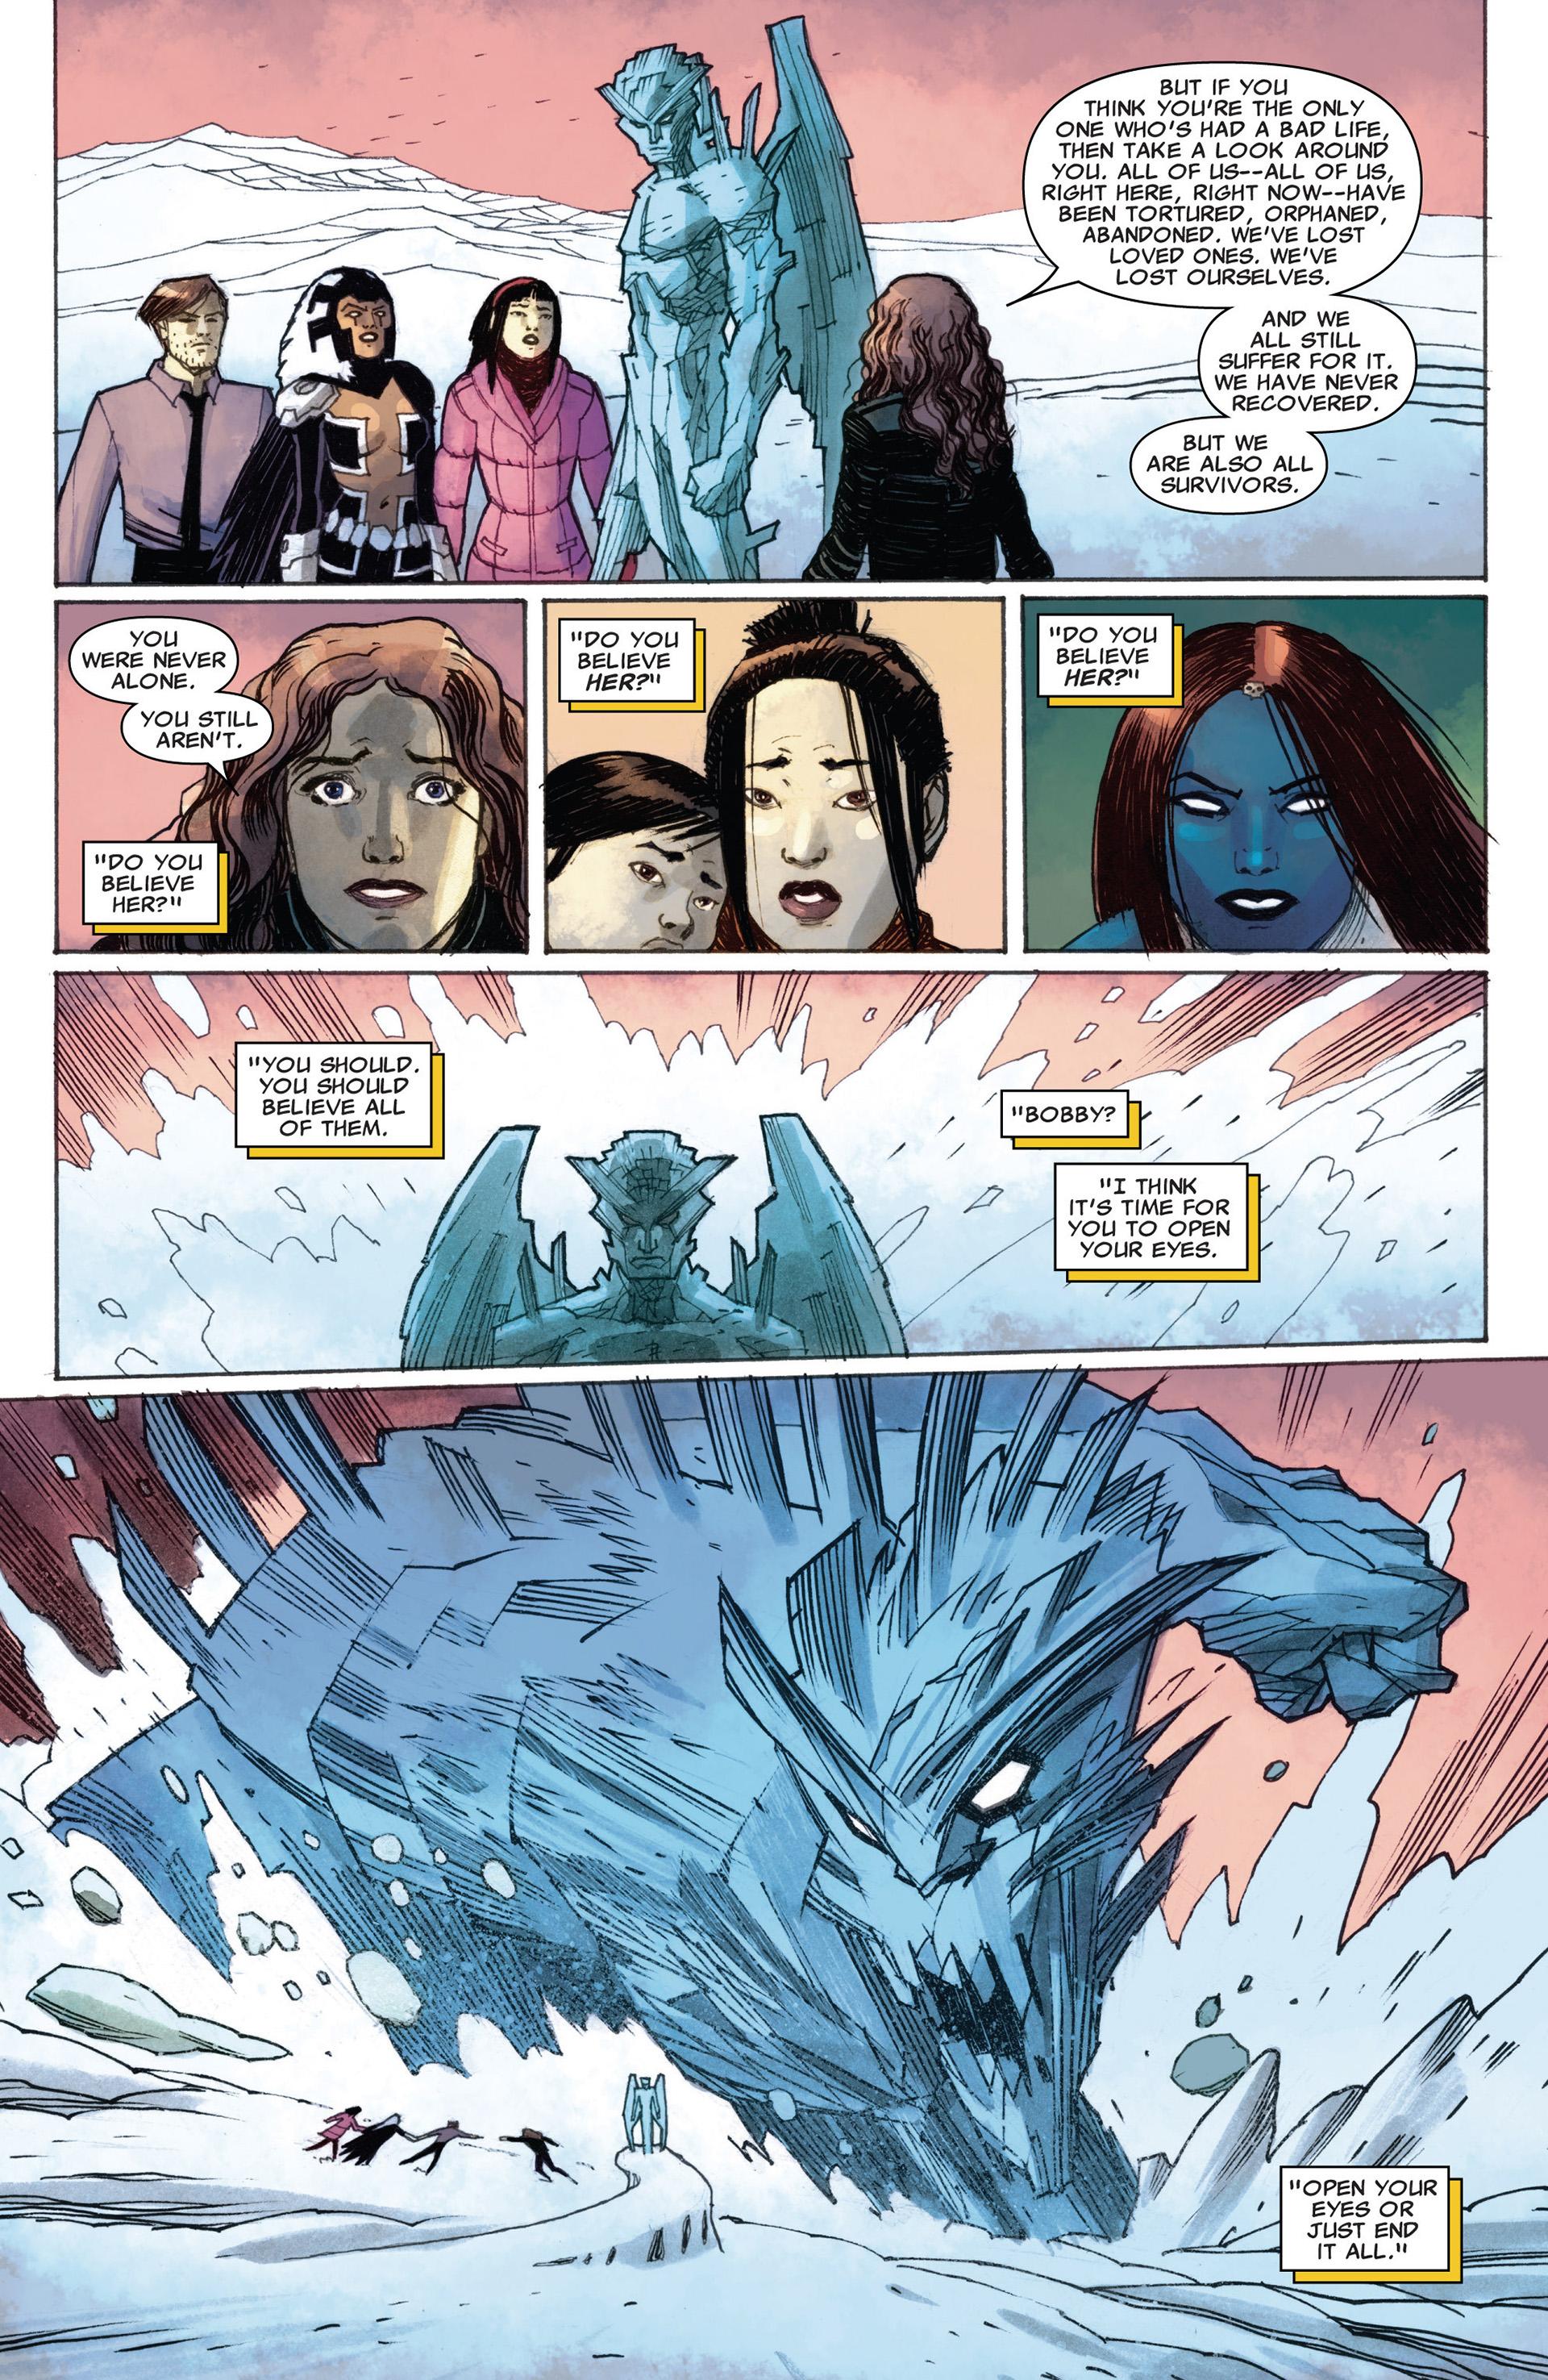 Read online Astonishing X-Men (2004) comic -  Issue #65 - 15